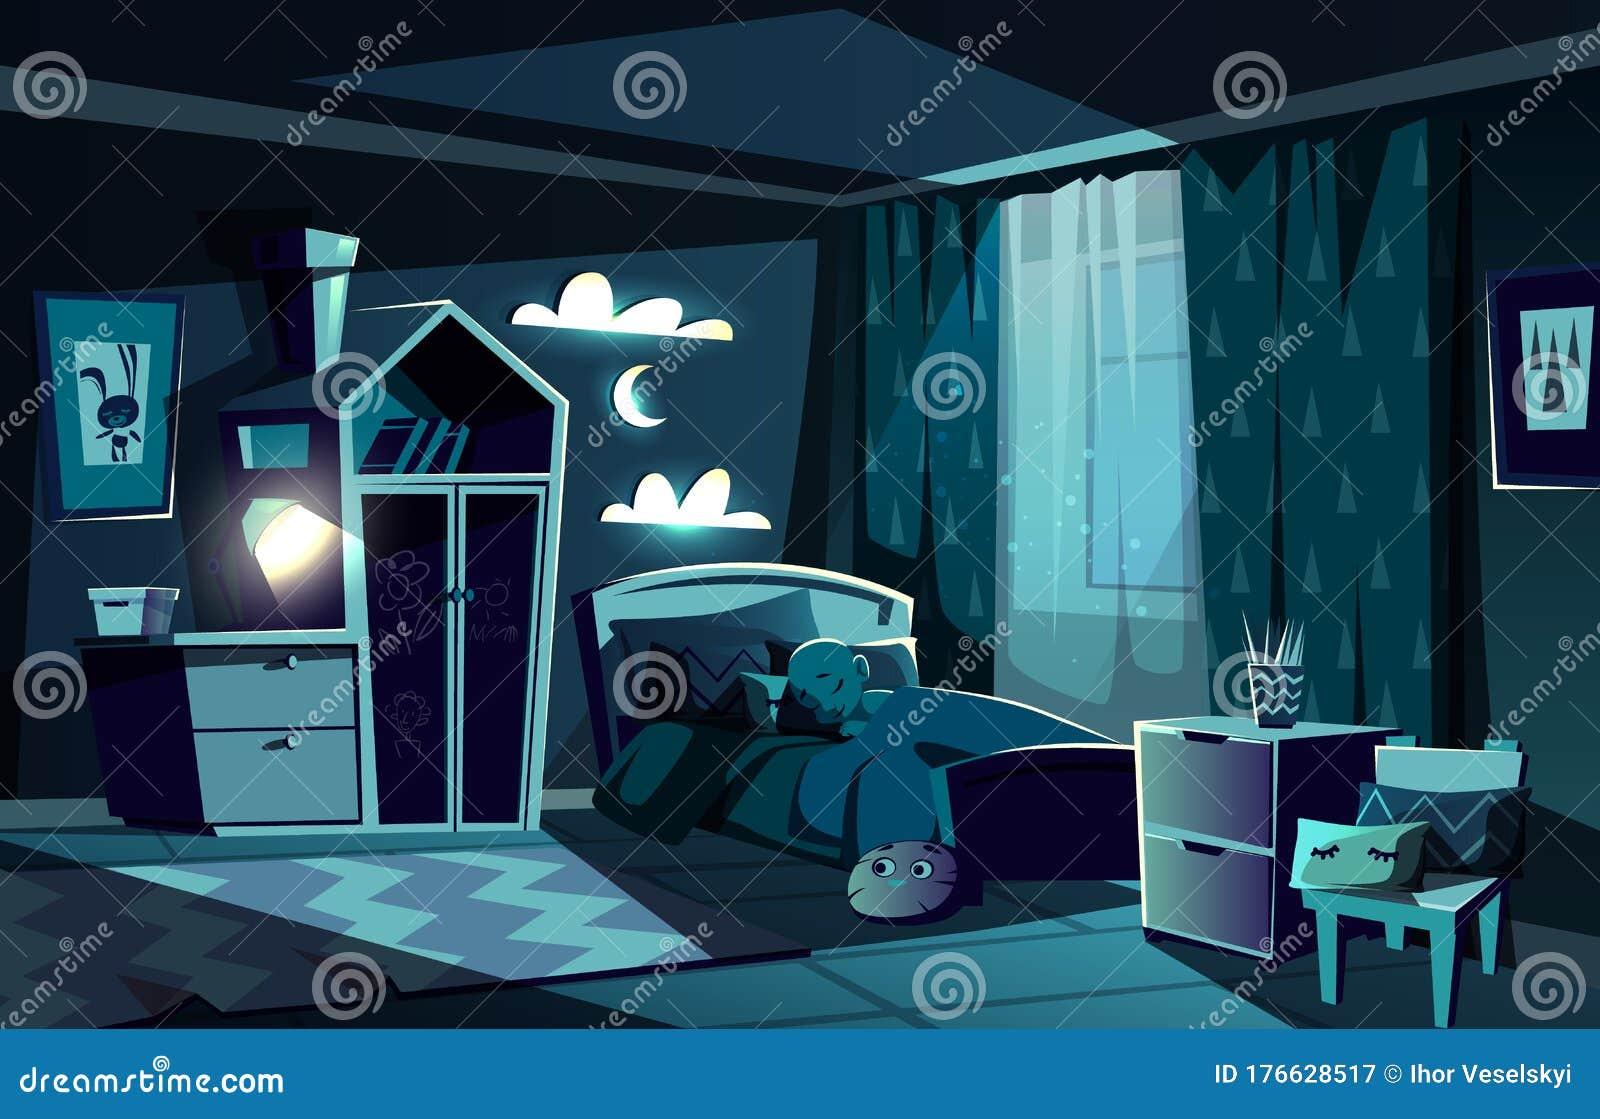 Child Sleeping In Bed In Bedroom Cartoon Stock Vector Illustration Of Calm Cartoon 176628517